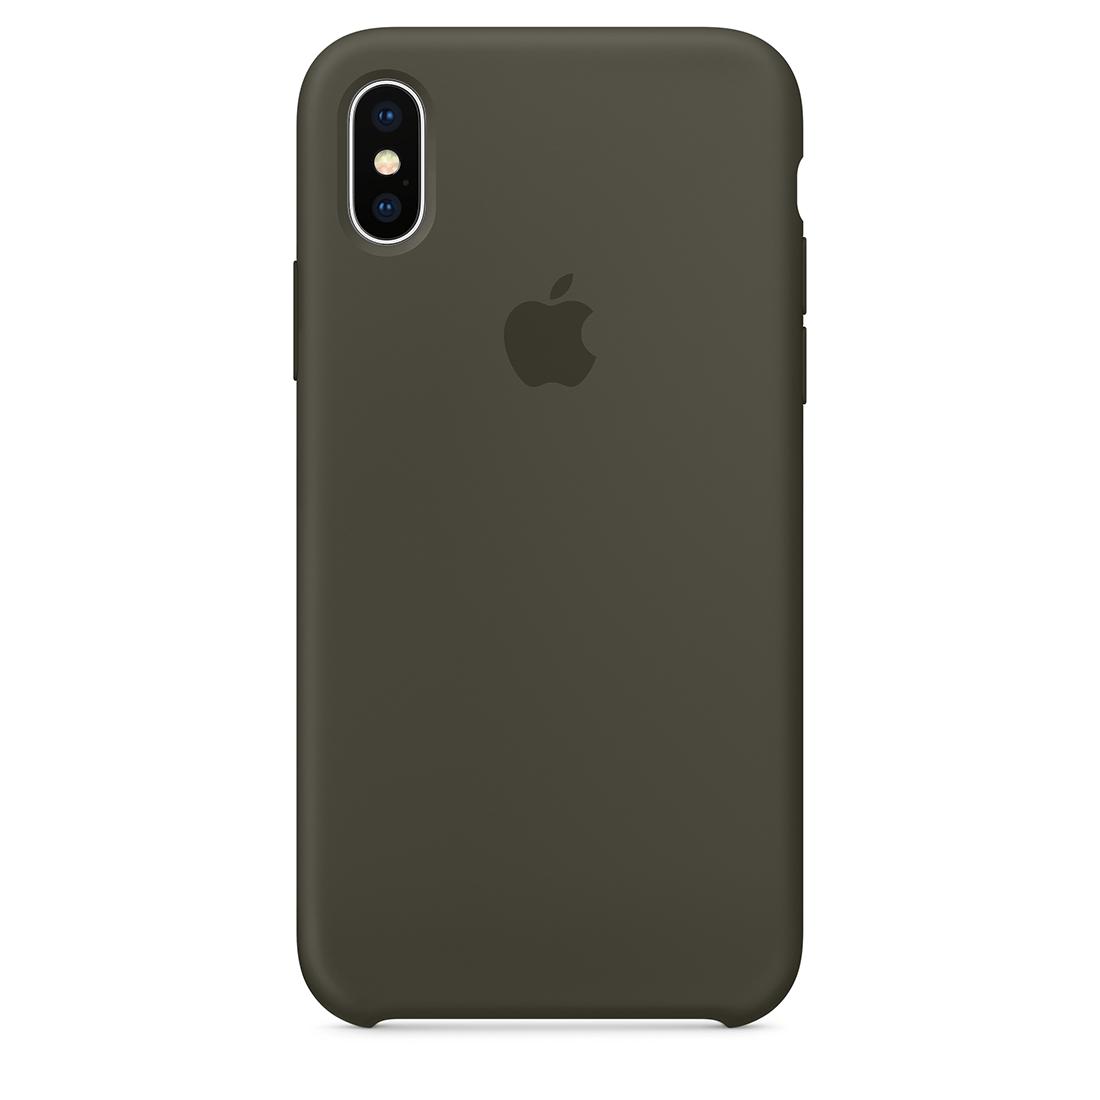 apple-iphone-x-silicone-case-in-dark-olive